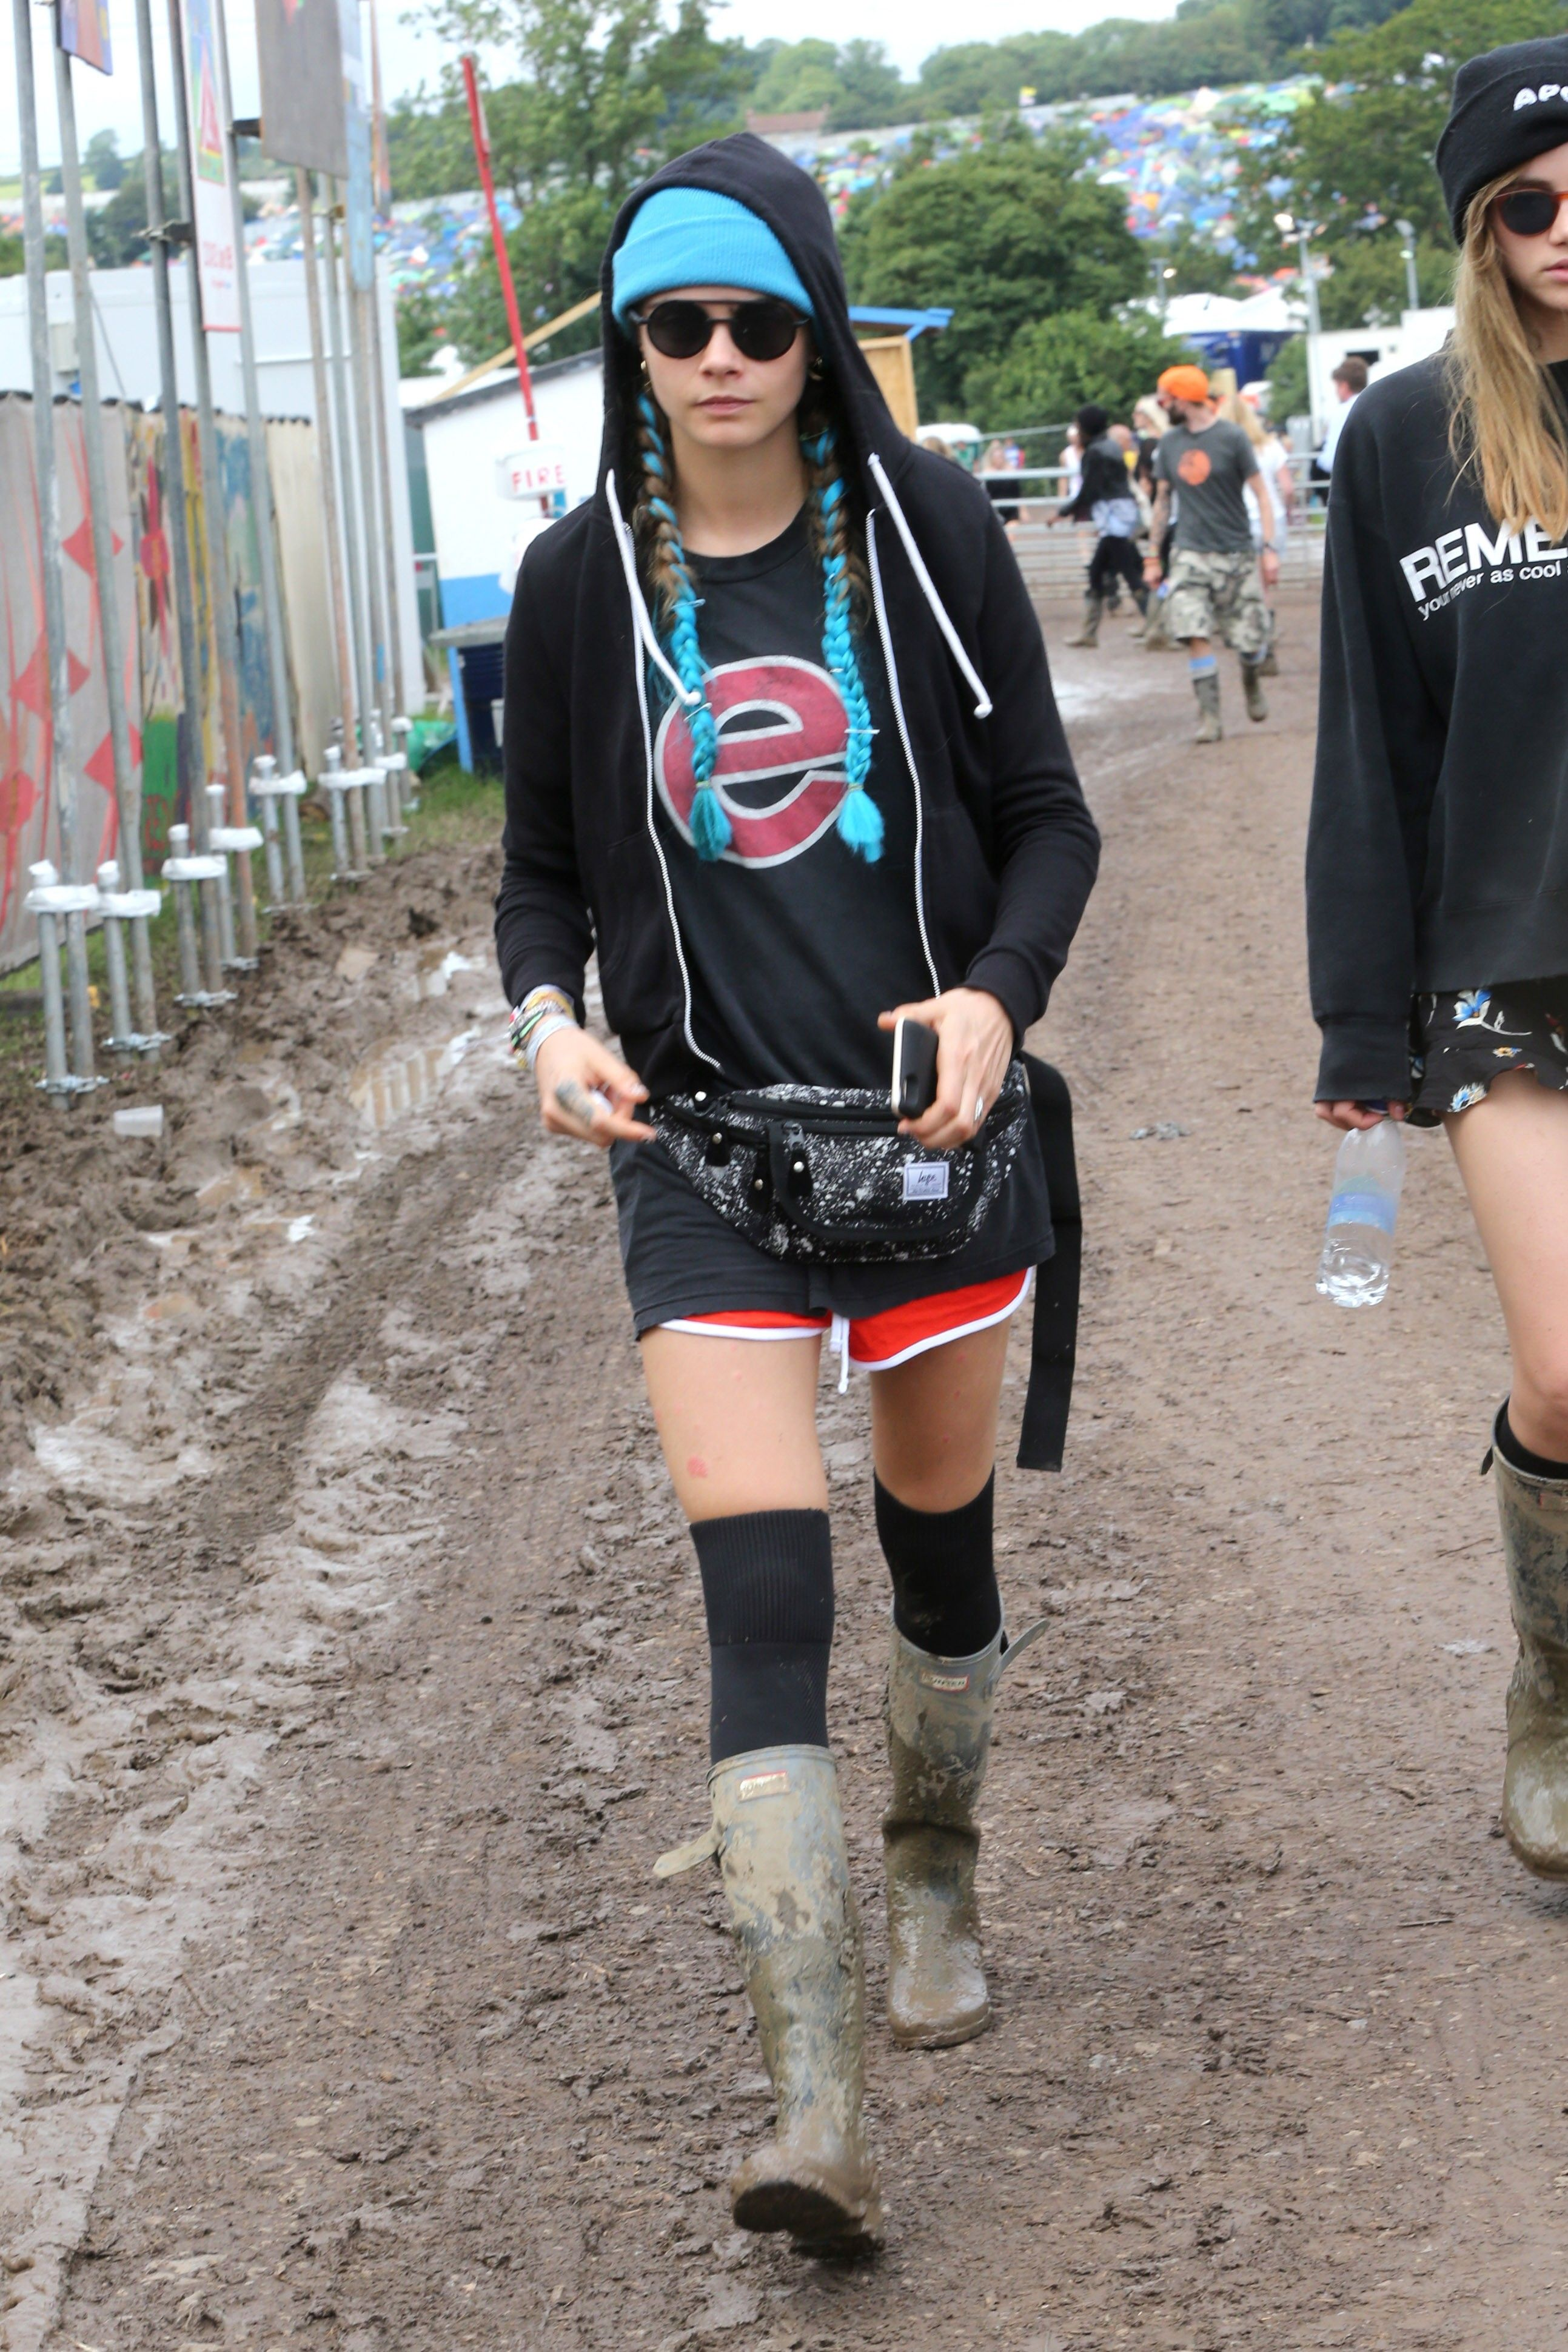 ... black hoodie, black short shorts, thigh high socks and Hunter Original  Tall Rain Boots in Black at the 2016 Glastonbury Festival. ac0d730f7a